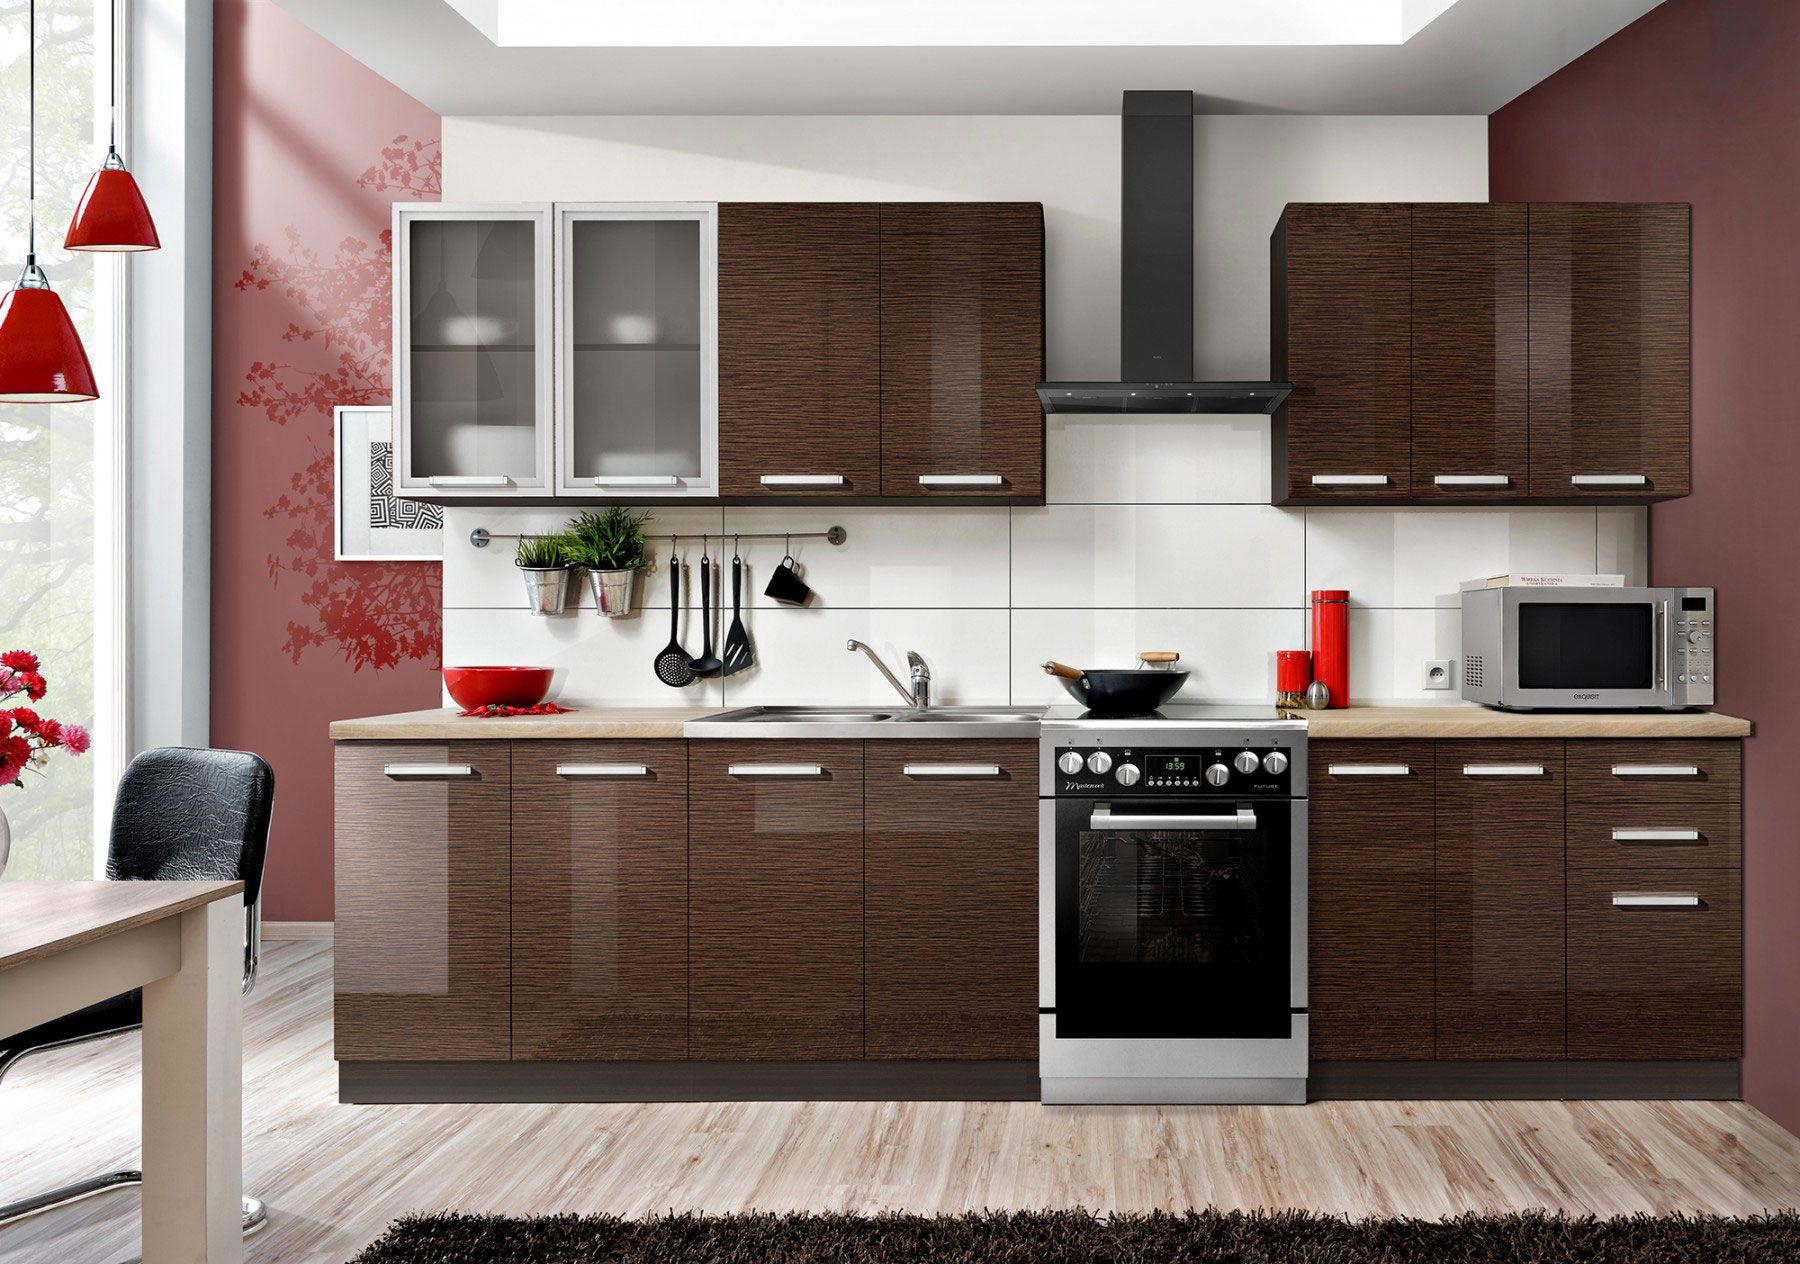 euro premium european kitchen style venge magic with glass doors kitchen cabinets nz on kitchen ideas european id=15439